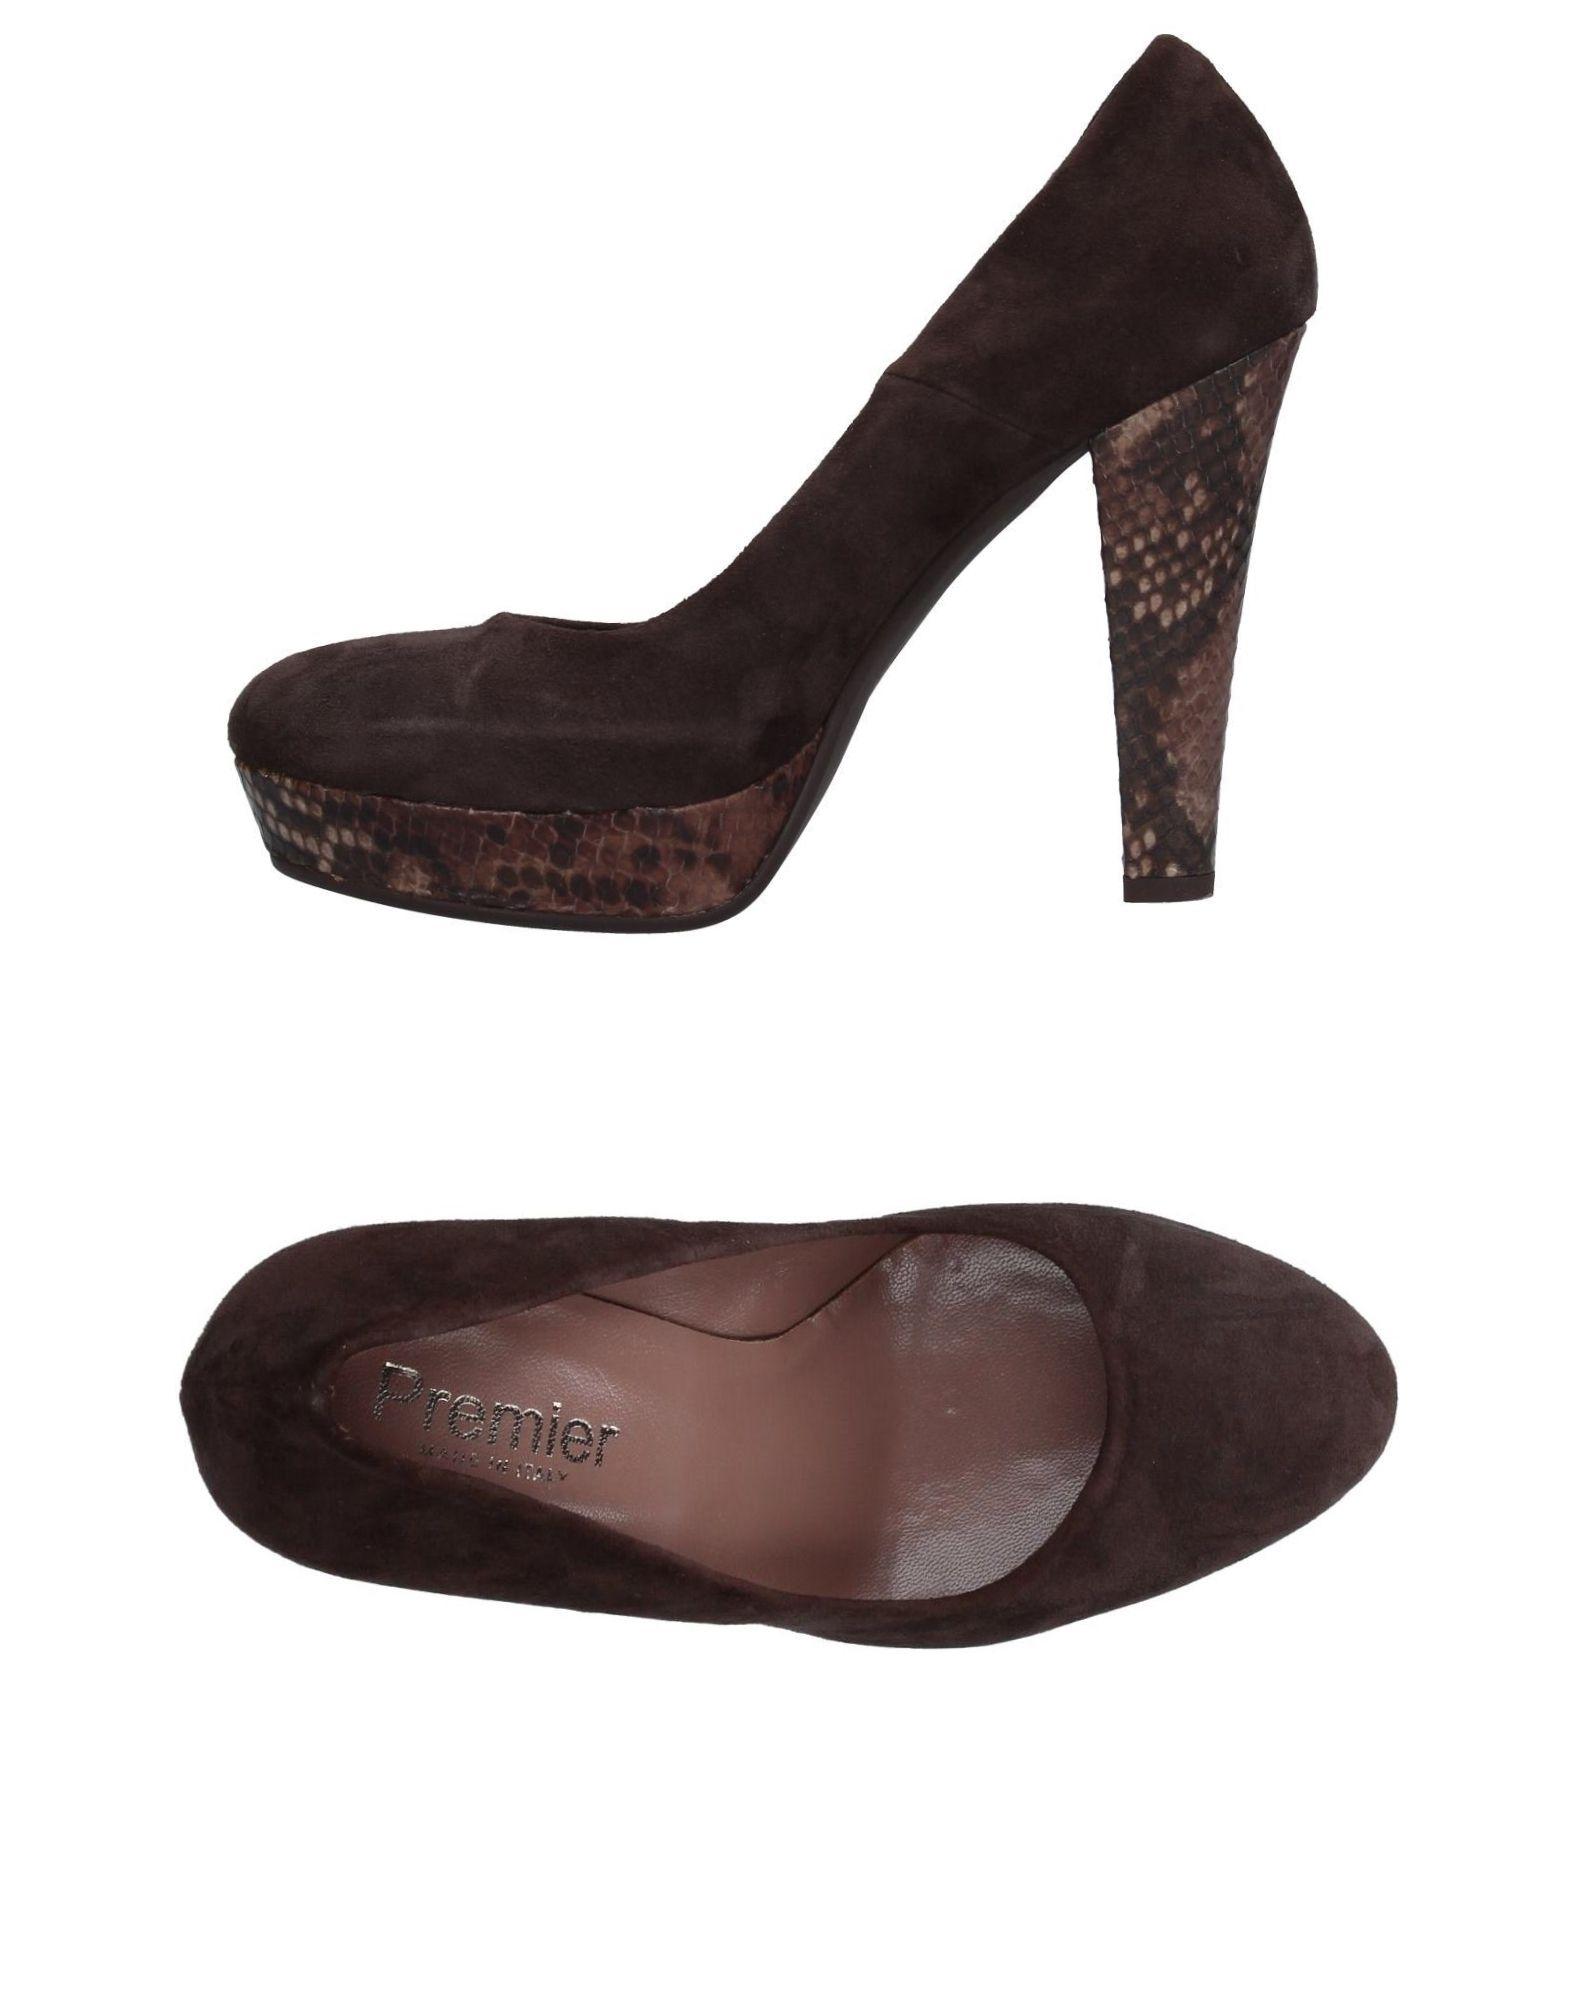 Premier Pumps Damen  11212754QB Gute Qualität beliebte Schuhe